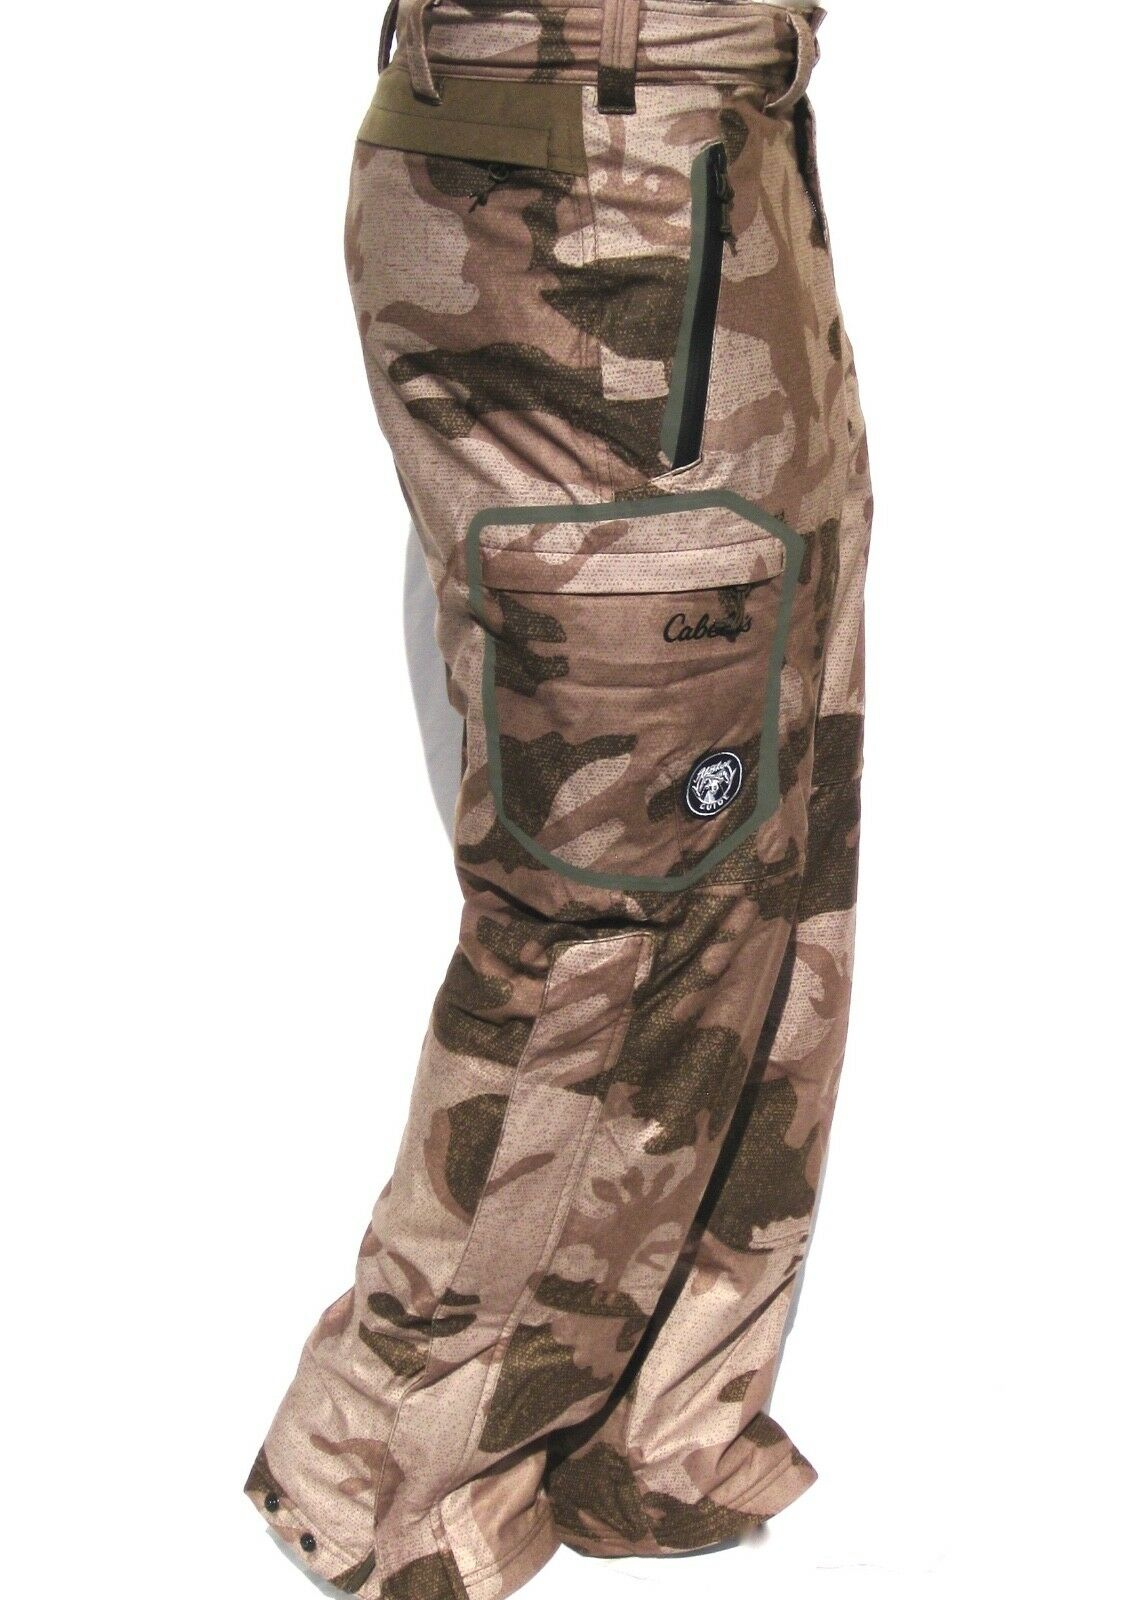 Cabela's Men's ALASKAN Guide Dry-Plus Hunting Pant Waterproof Outfitter Camo